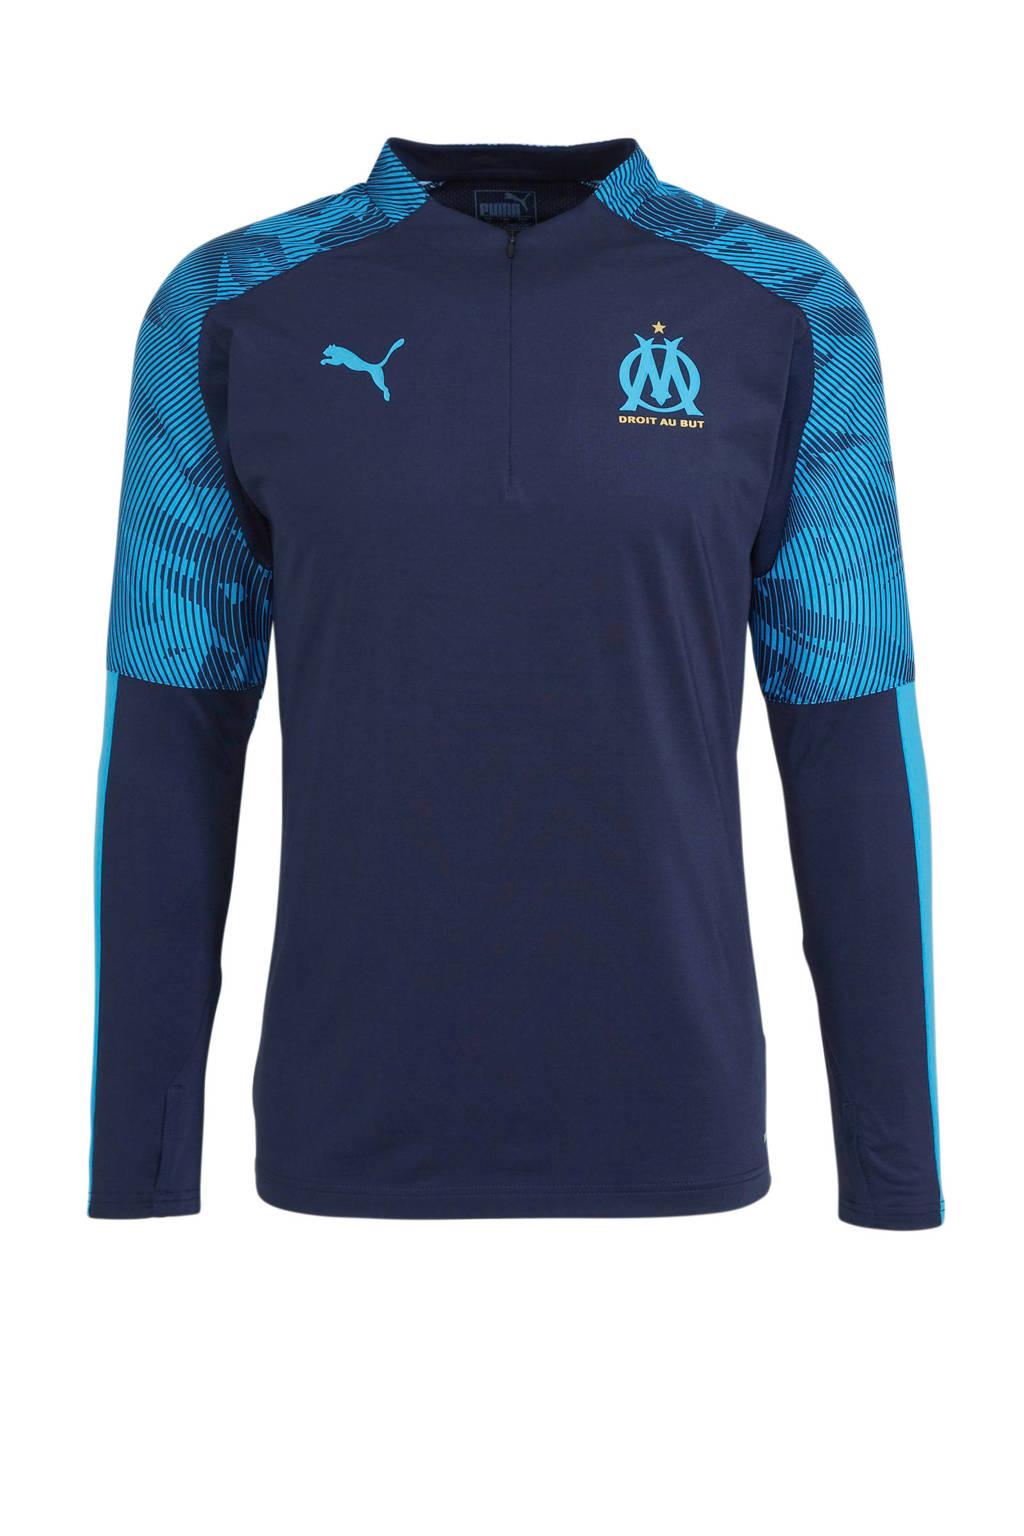 Puma Senior Olympique Marseille voetbalshirt donkerblauw, Donkerblauw